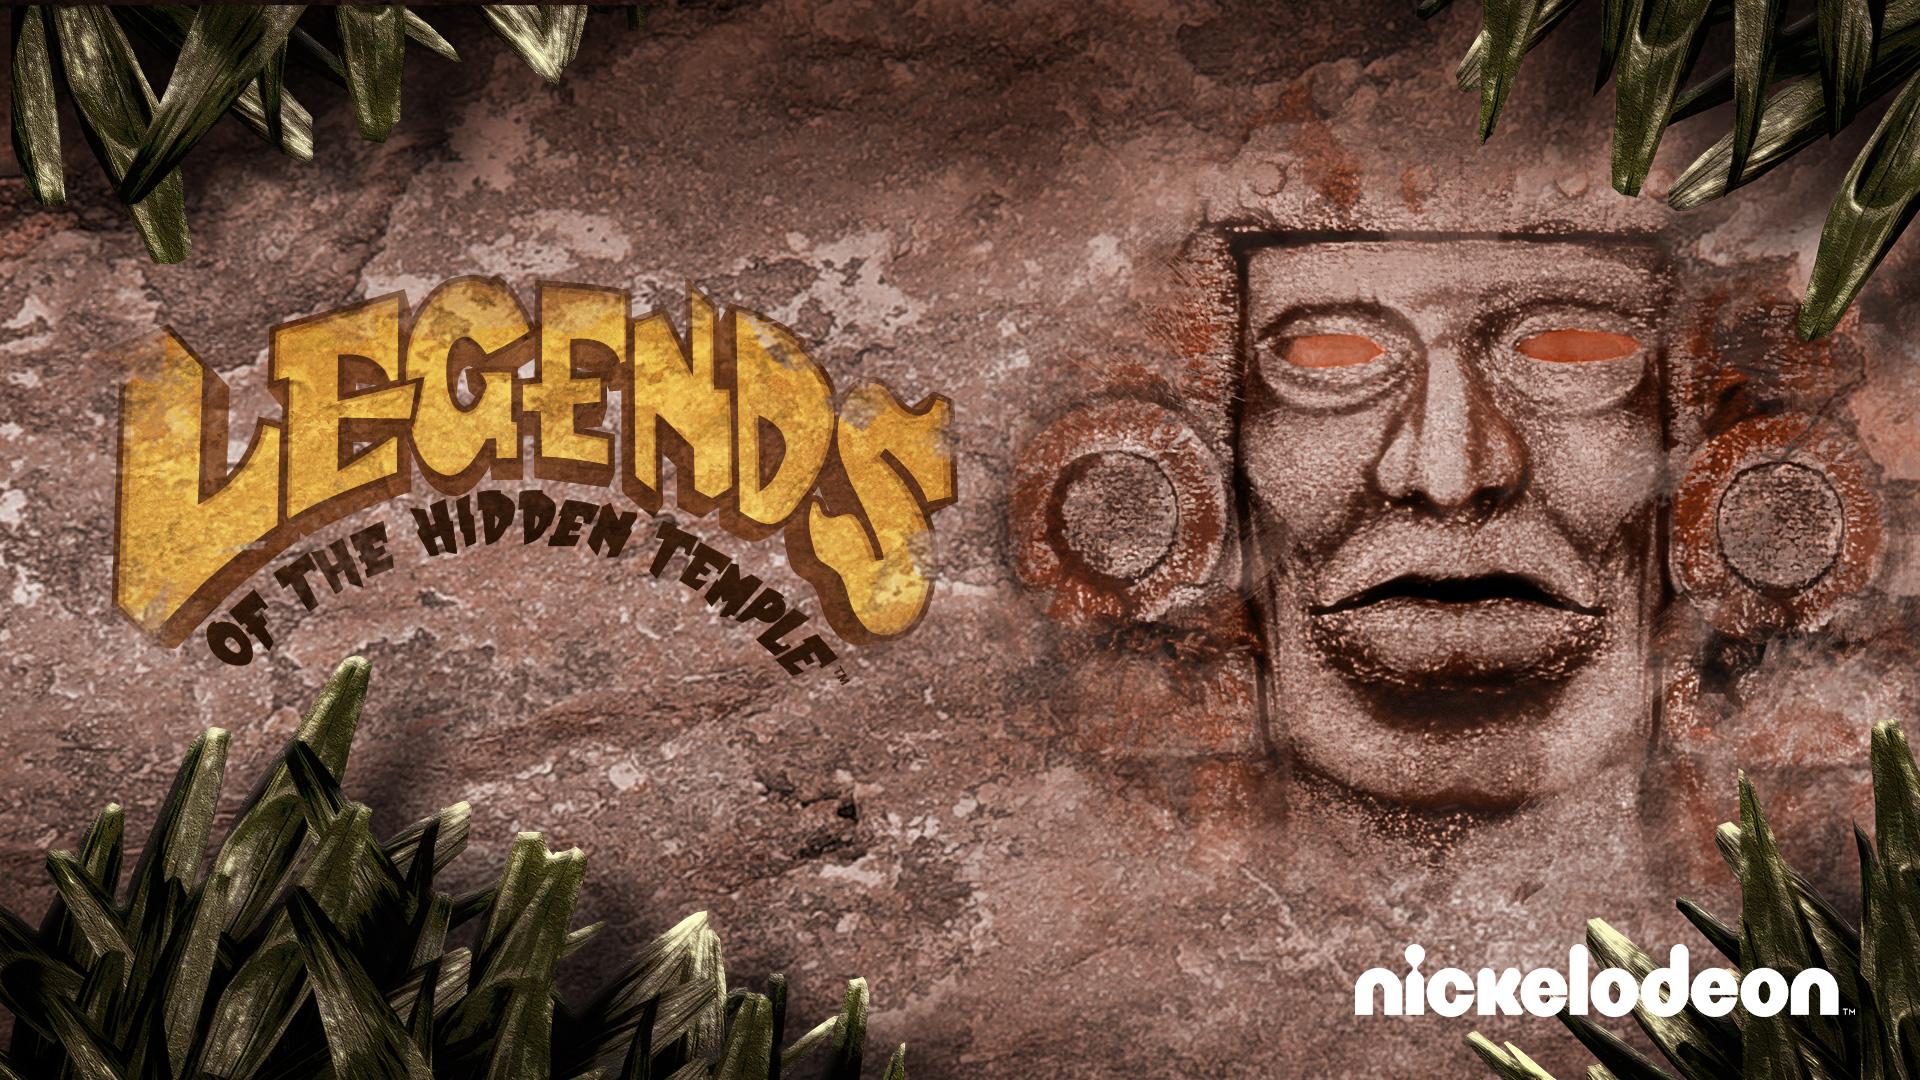 Legends of the Hidden Temple Season 1